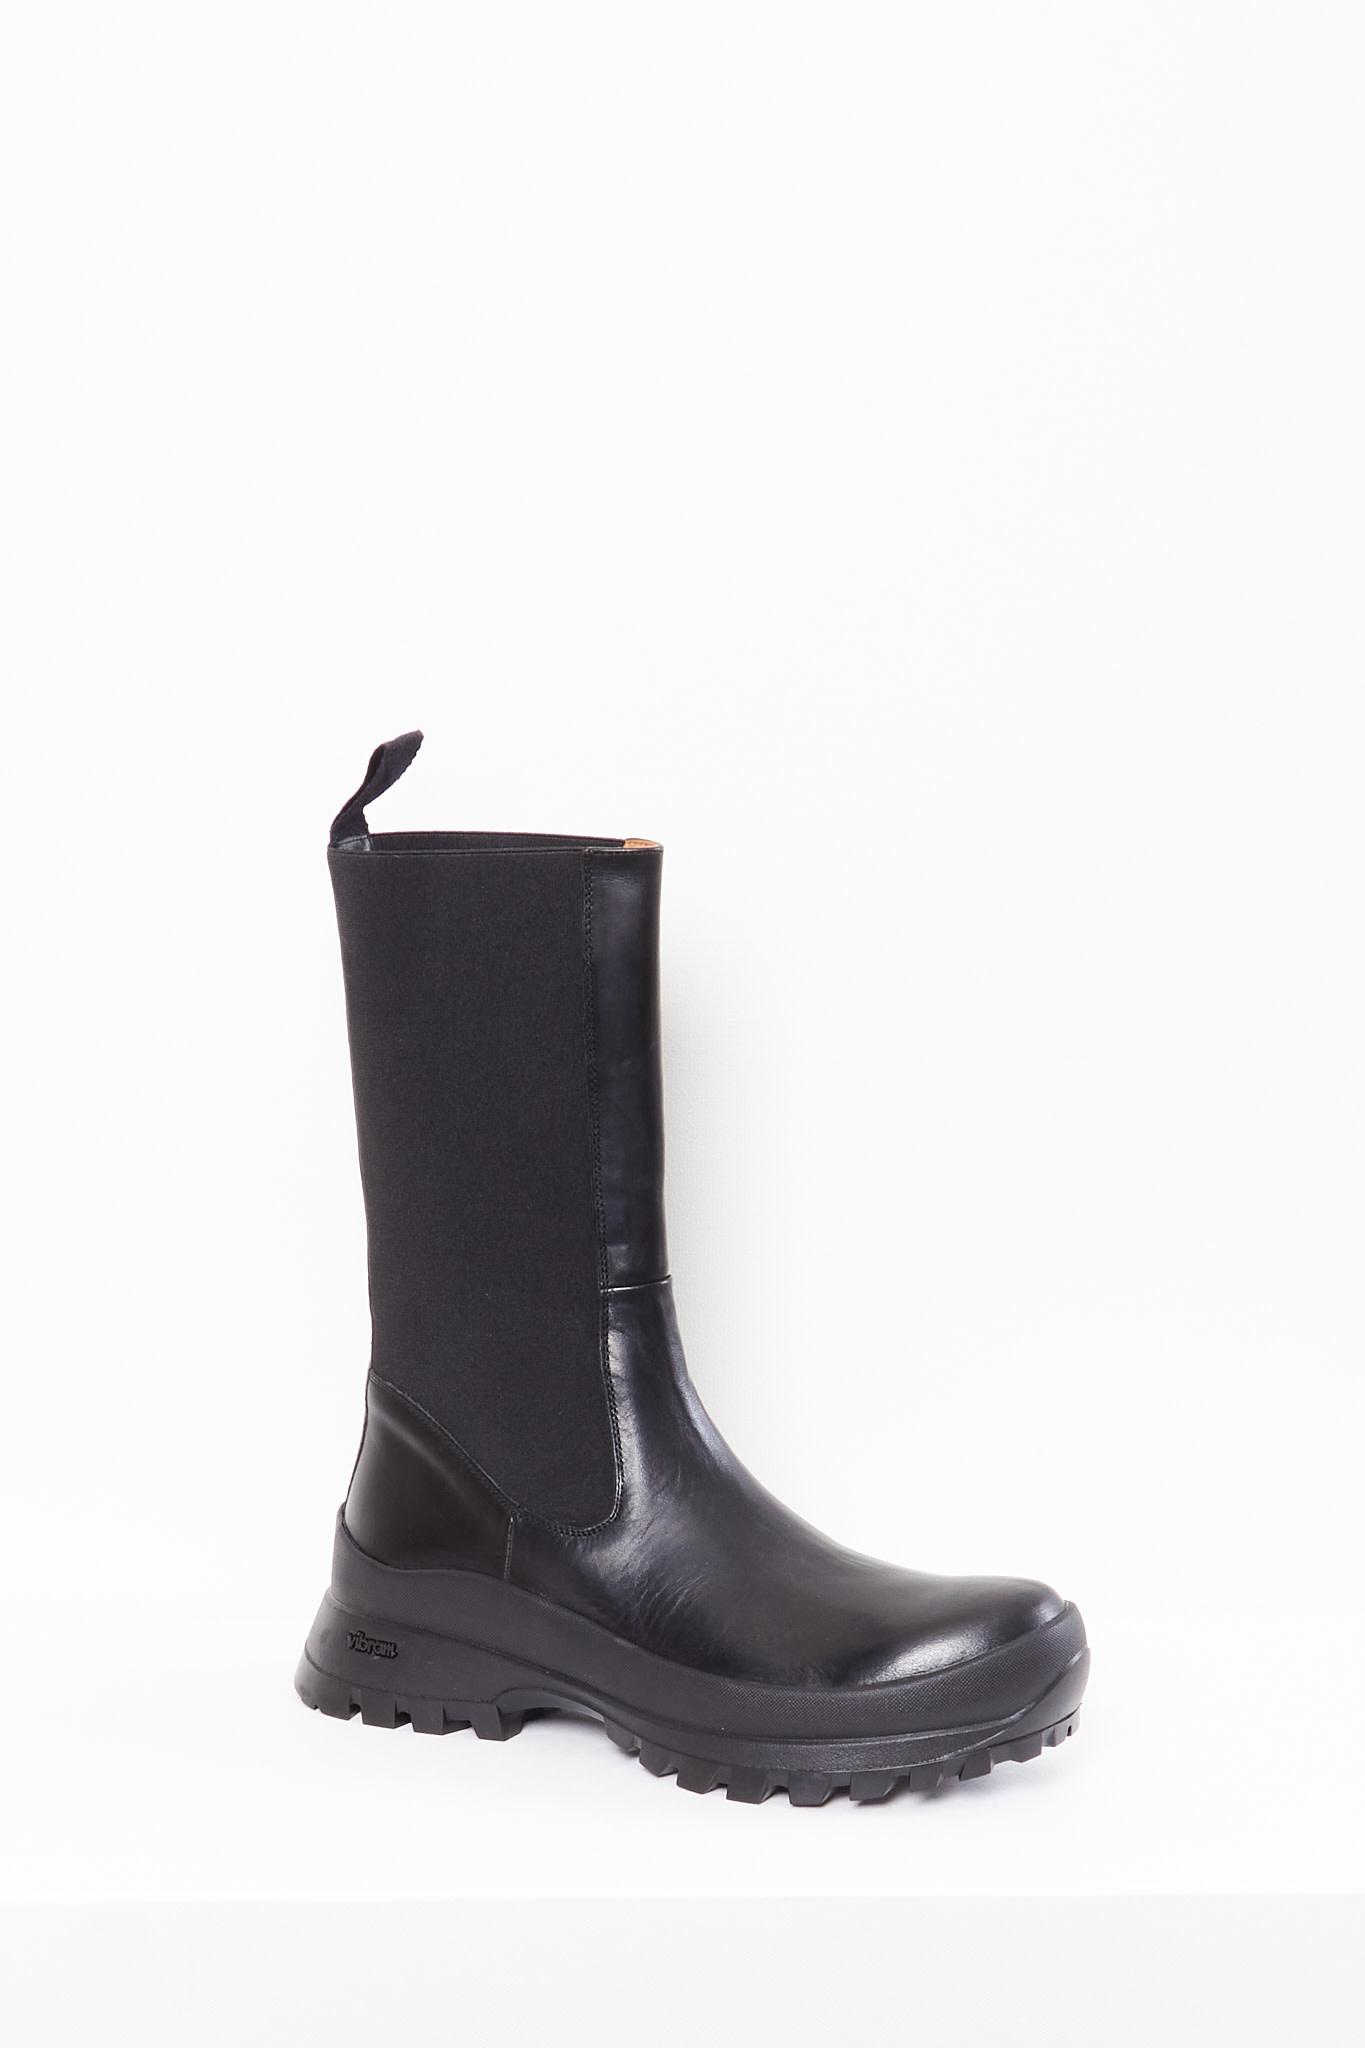 atp - Tolentino boots